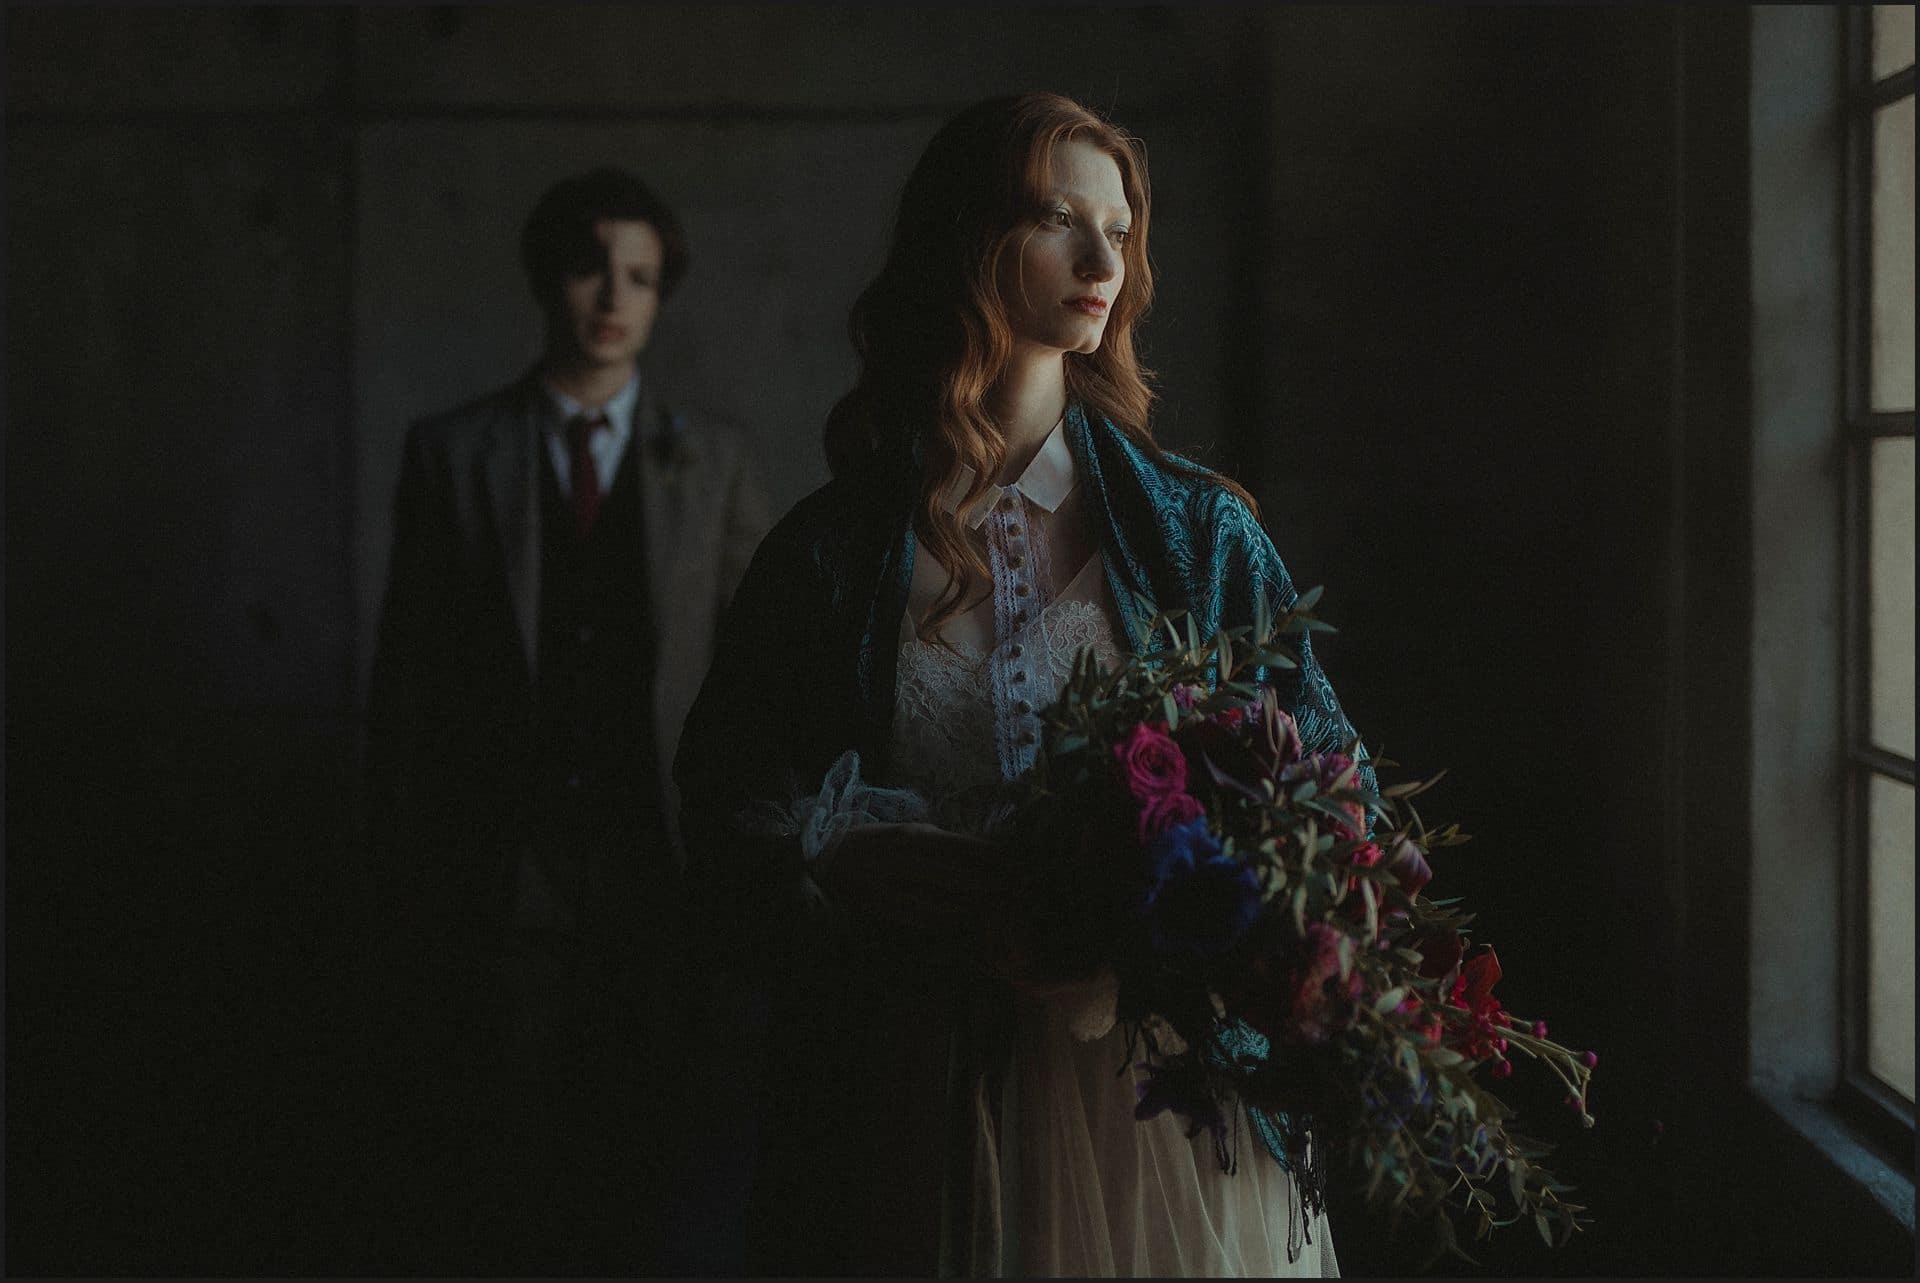 bouquet, wedding flowers, bride, groom, wedding dress, unconventional wedding, cross studio, milan, wedding photographer, wedding in italy